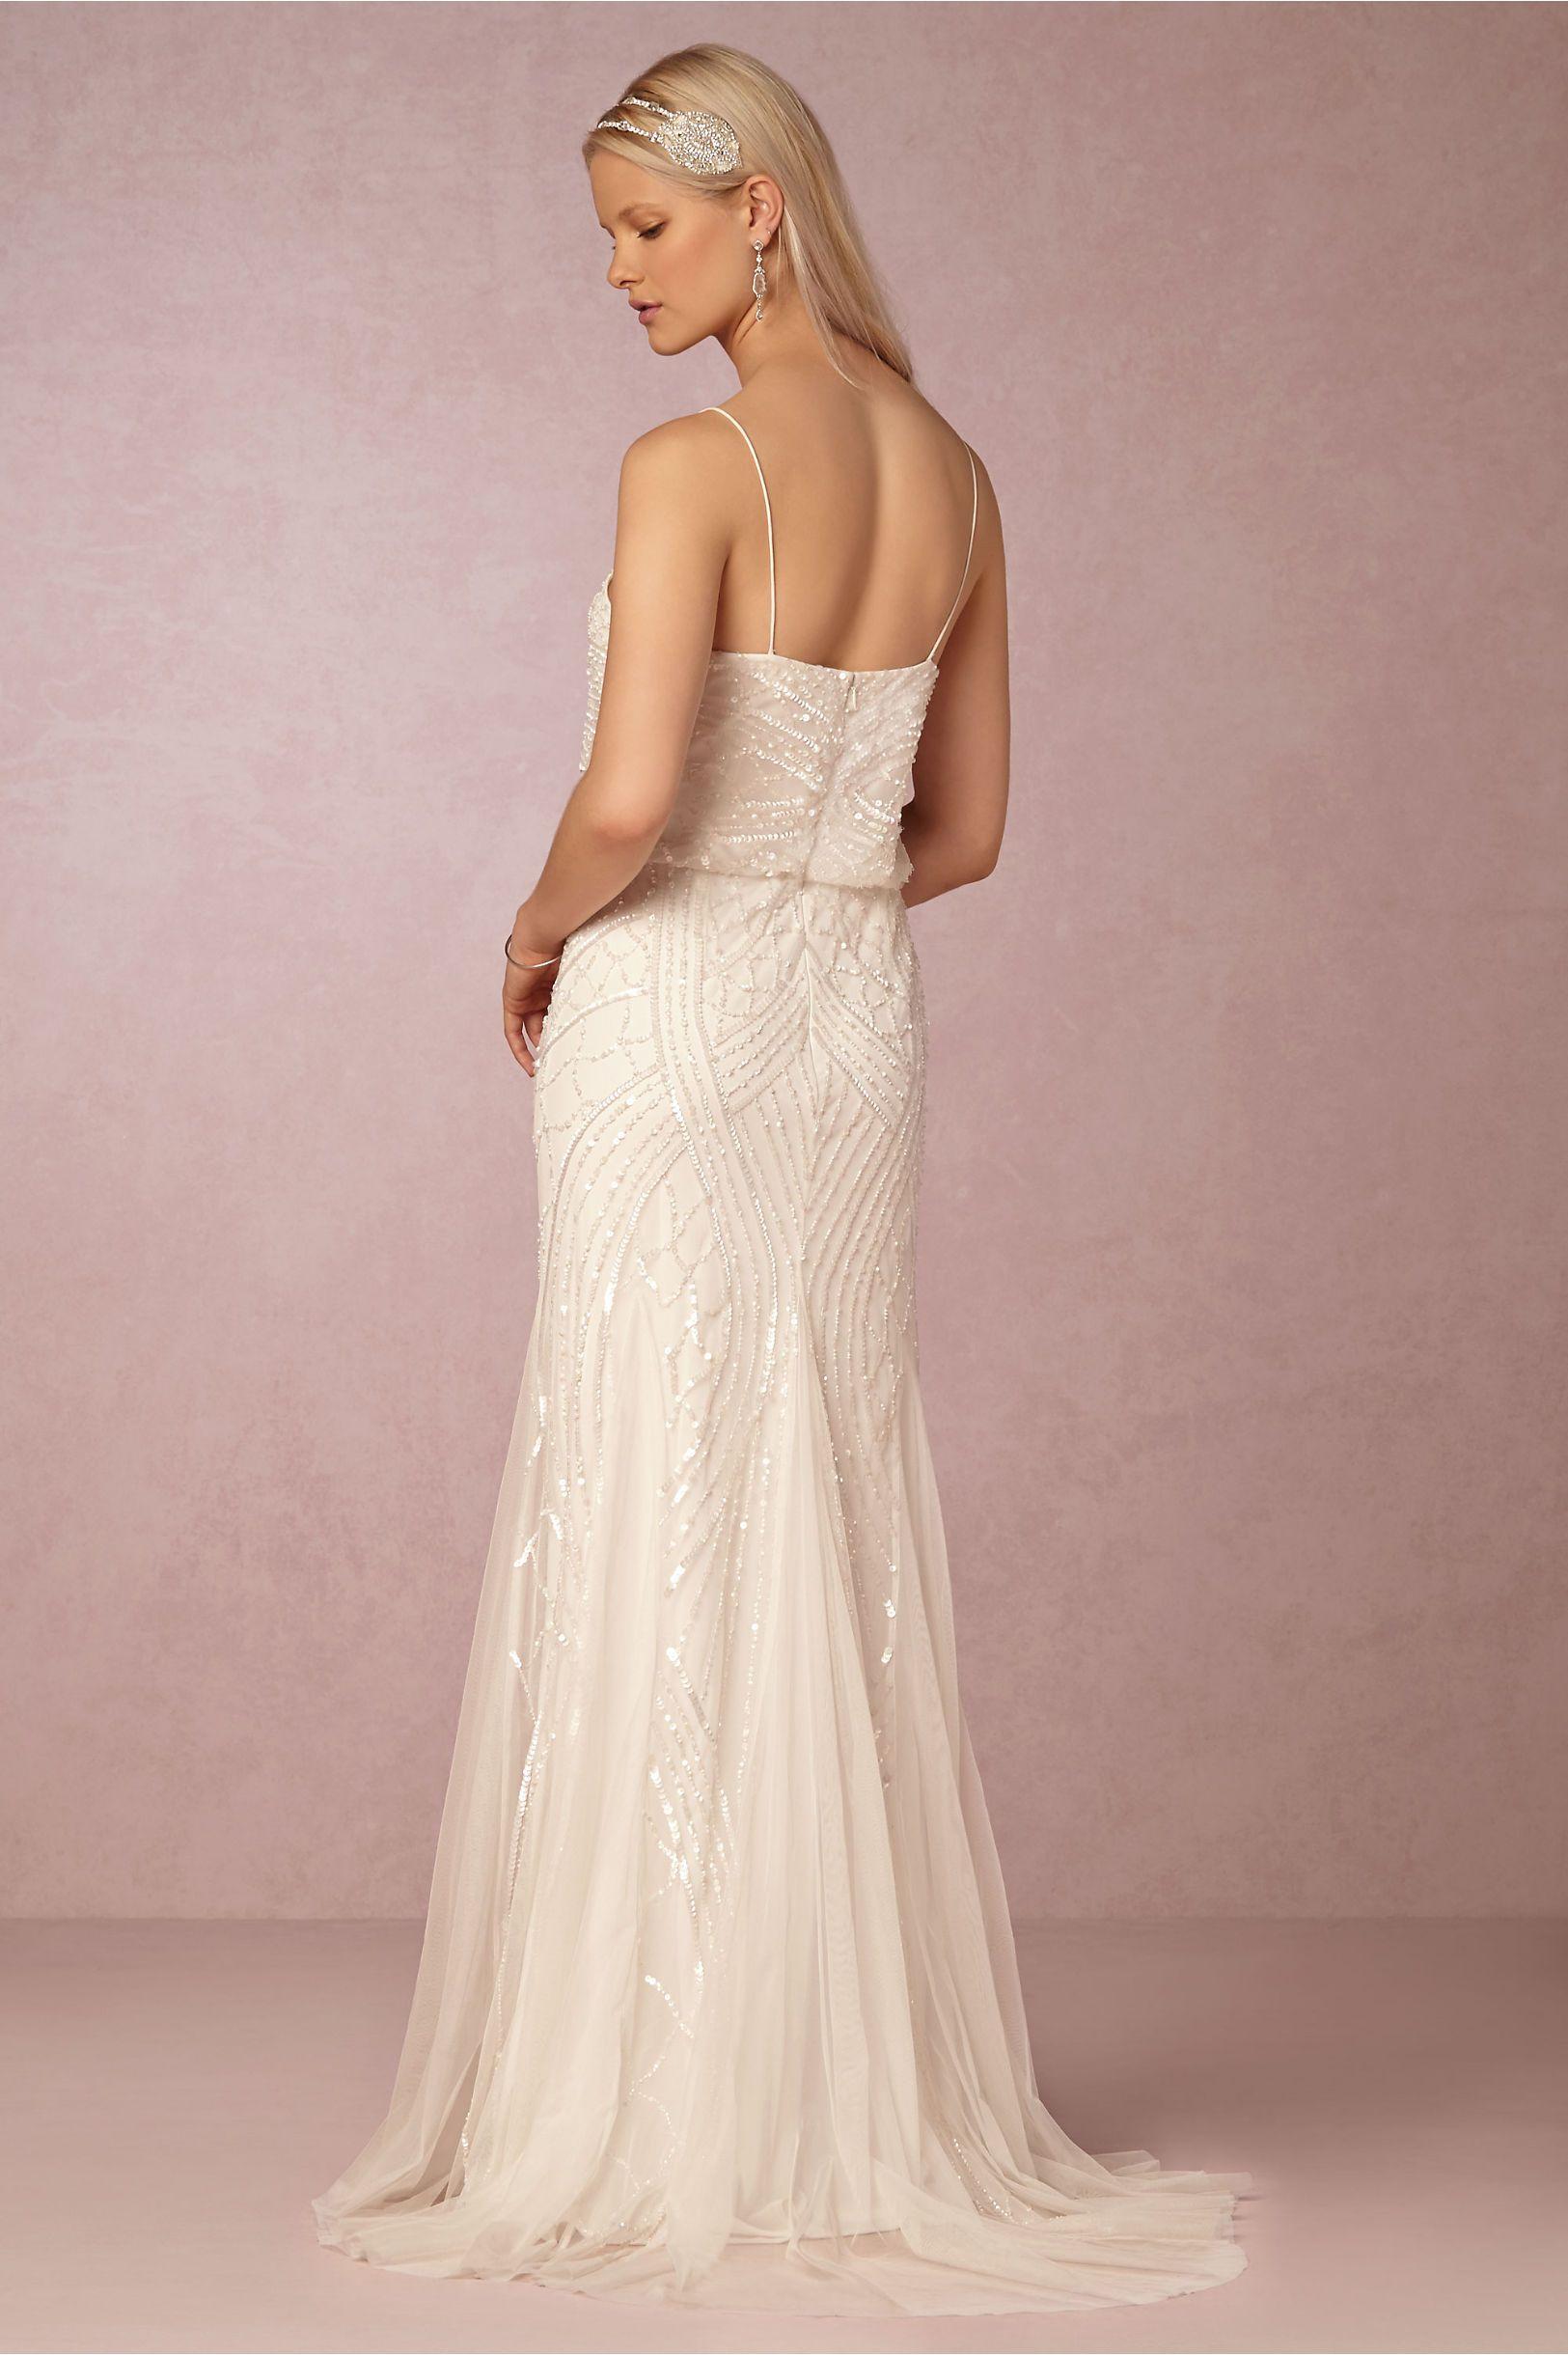 BHLDN Grazia Dress in Bride Beach & Honeymoon at BHLDN | Jen\'s ...